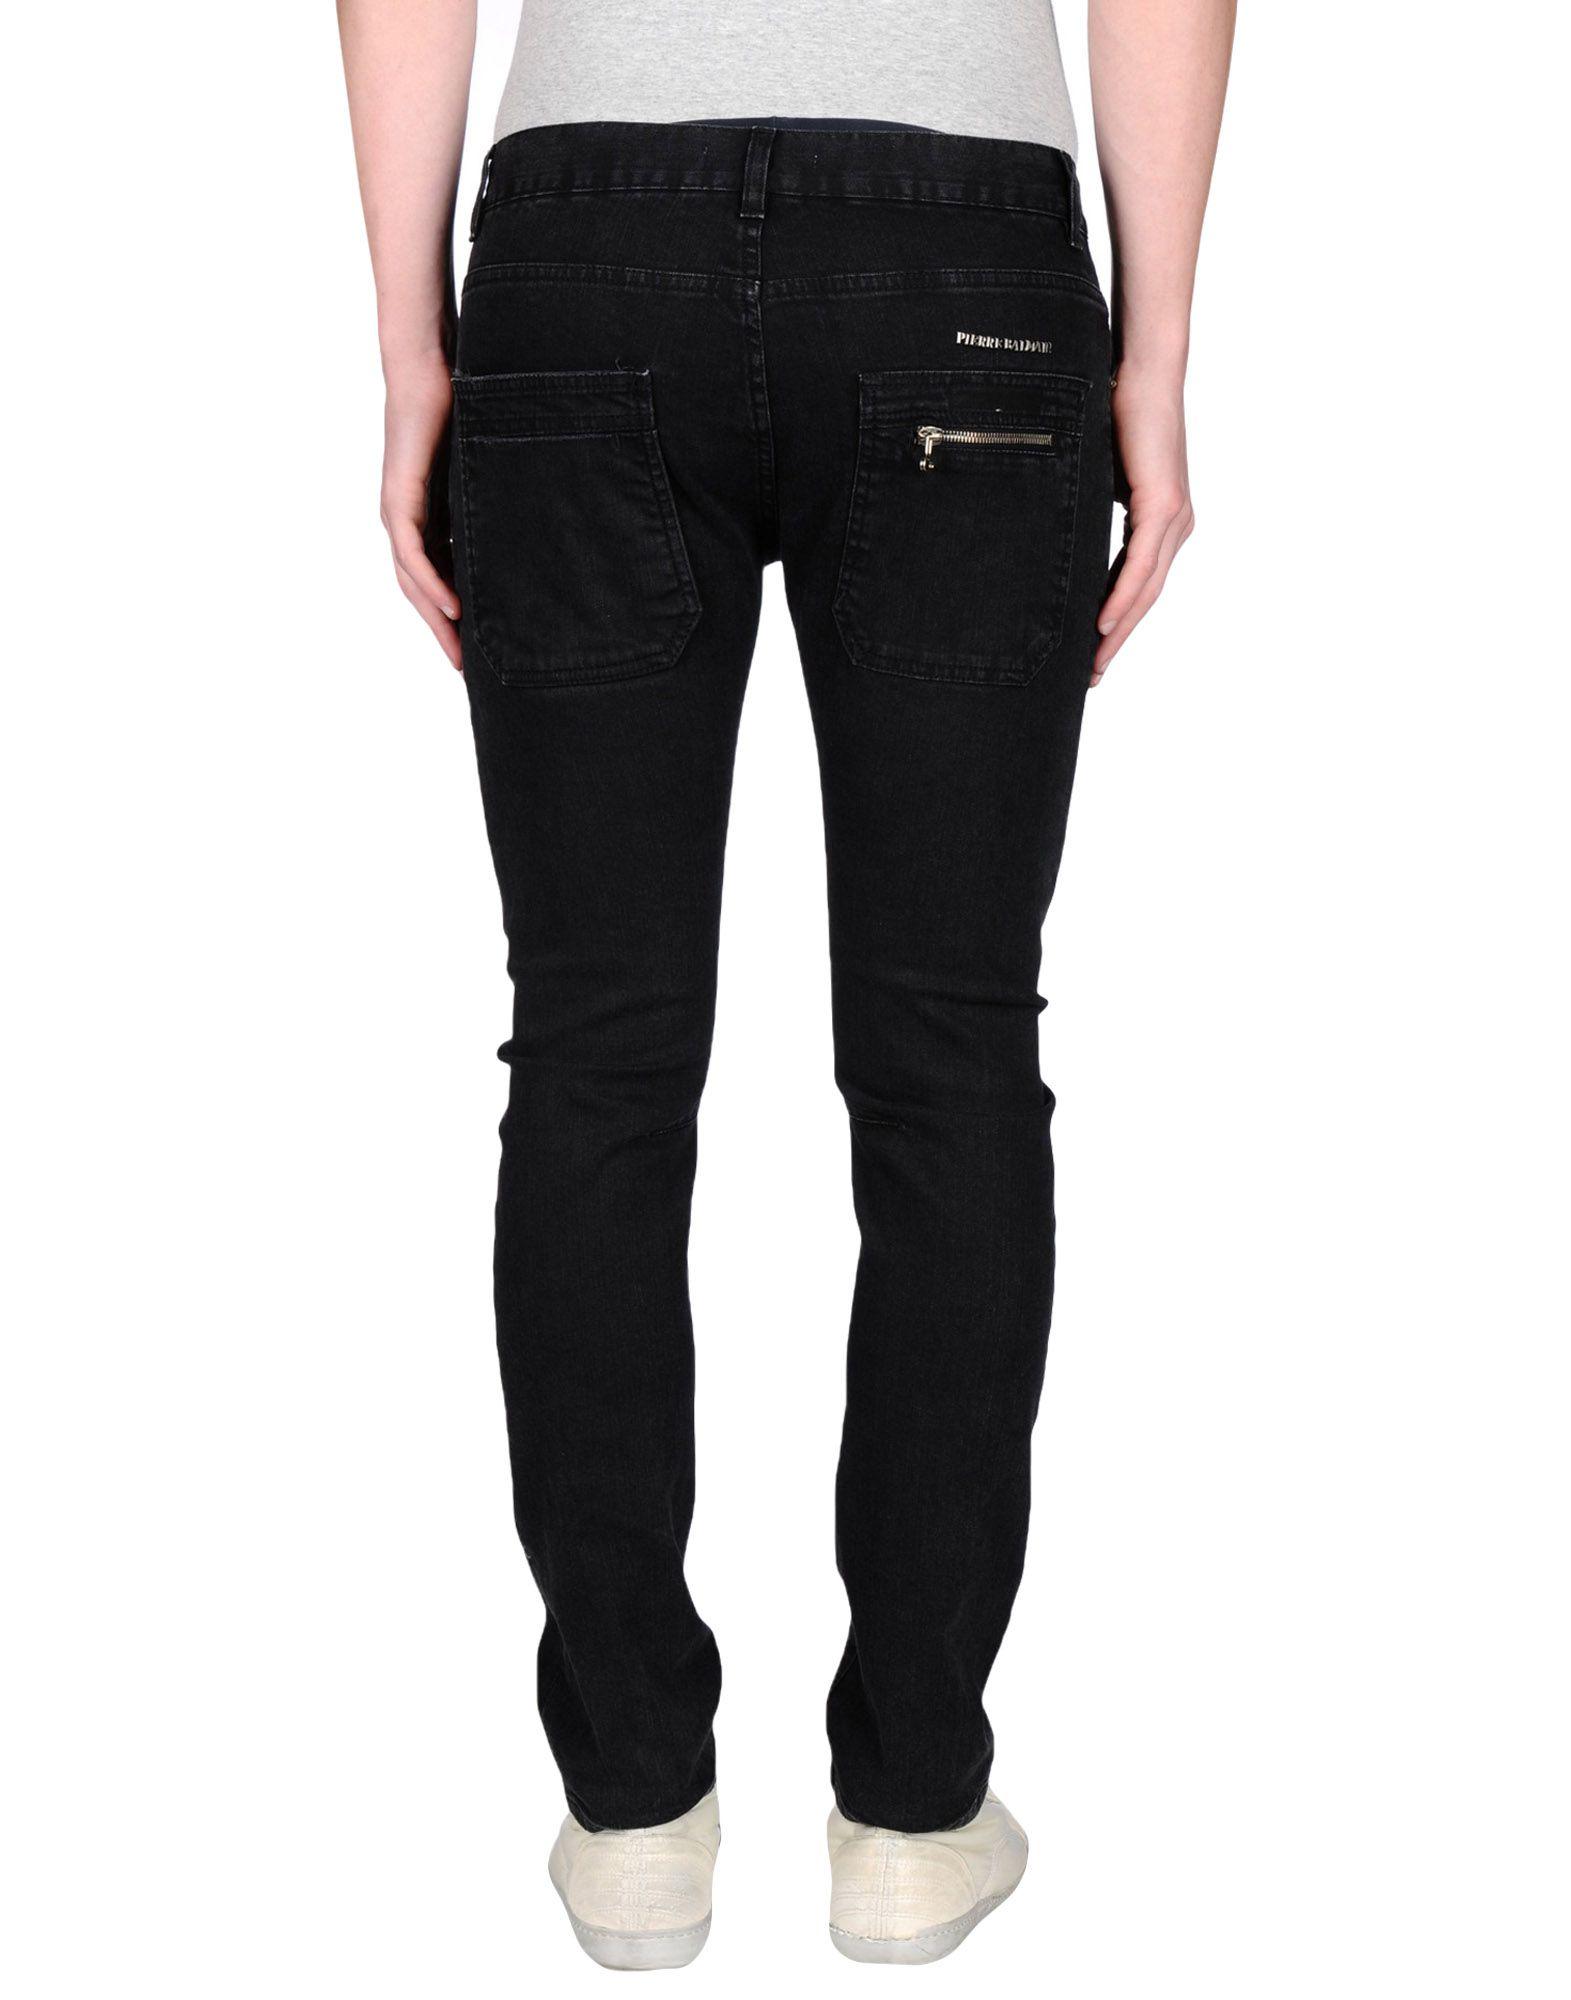 balmain skinny zip jeans in black for men. Black Bedroom Furniture Sets. Home Design Ideas